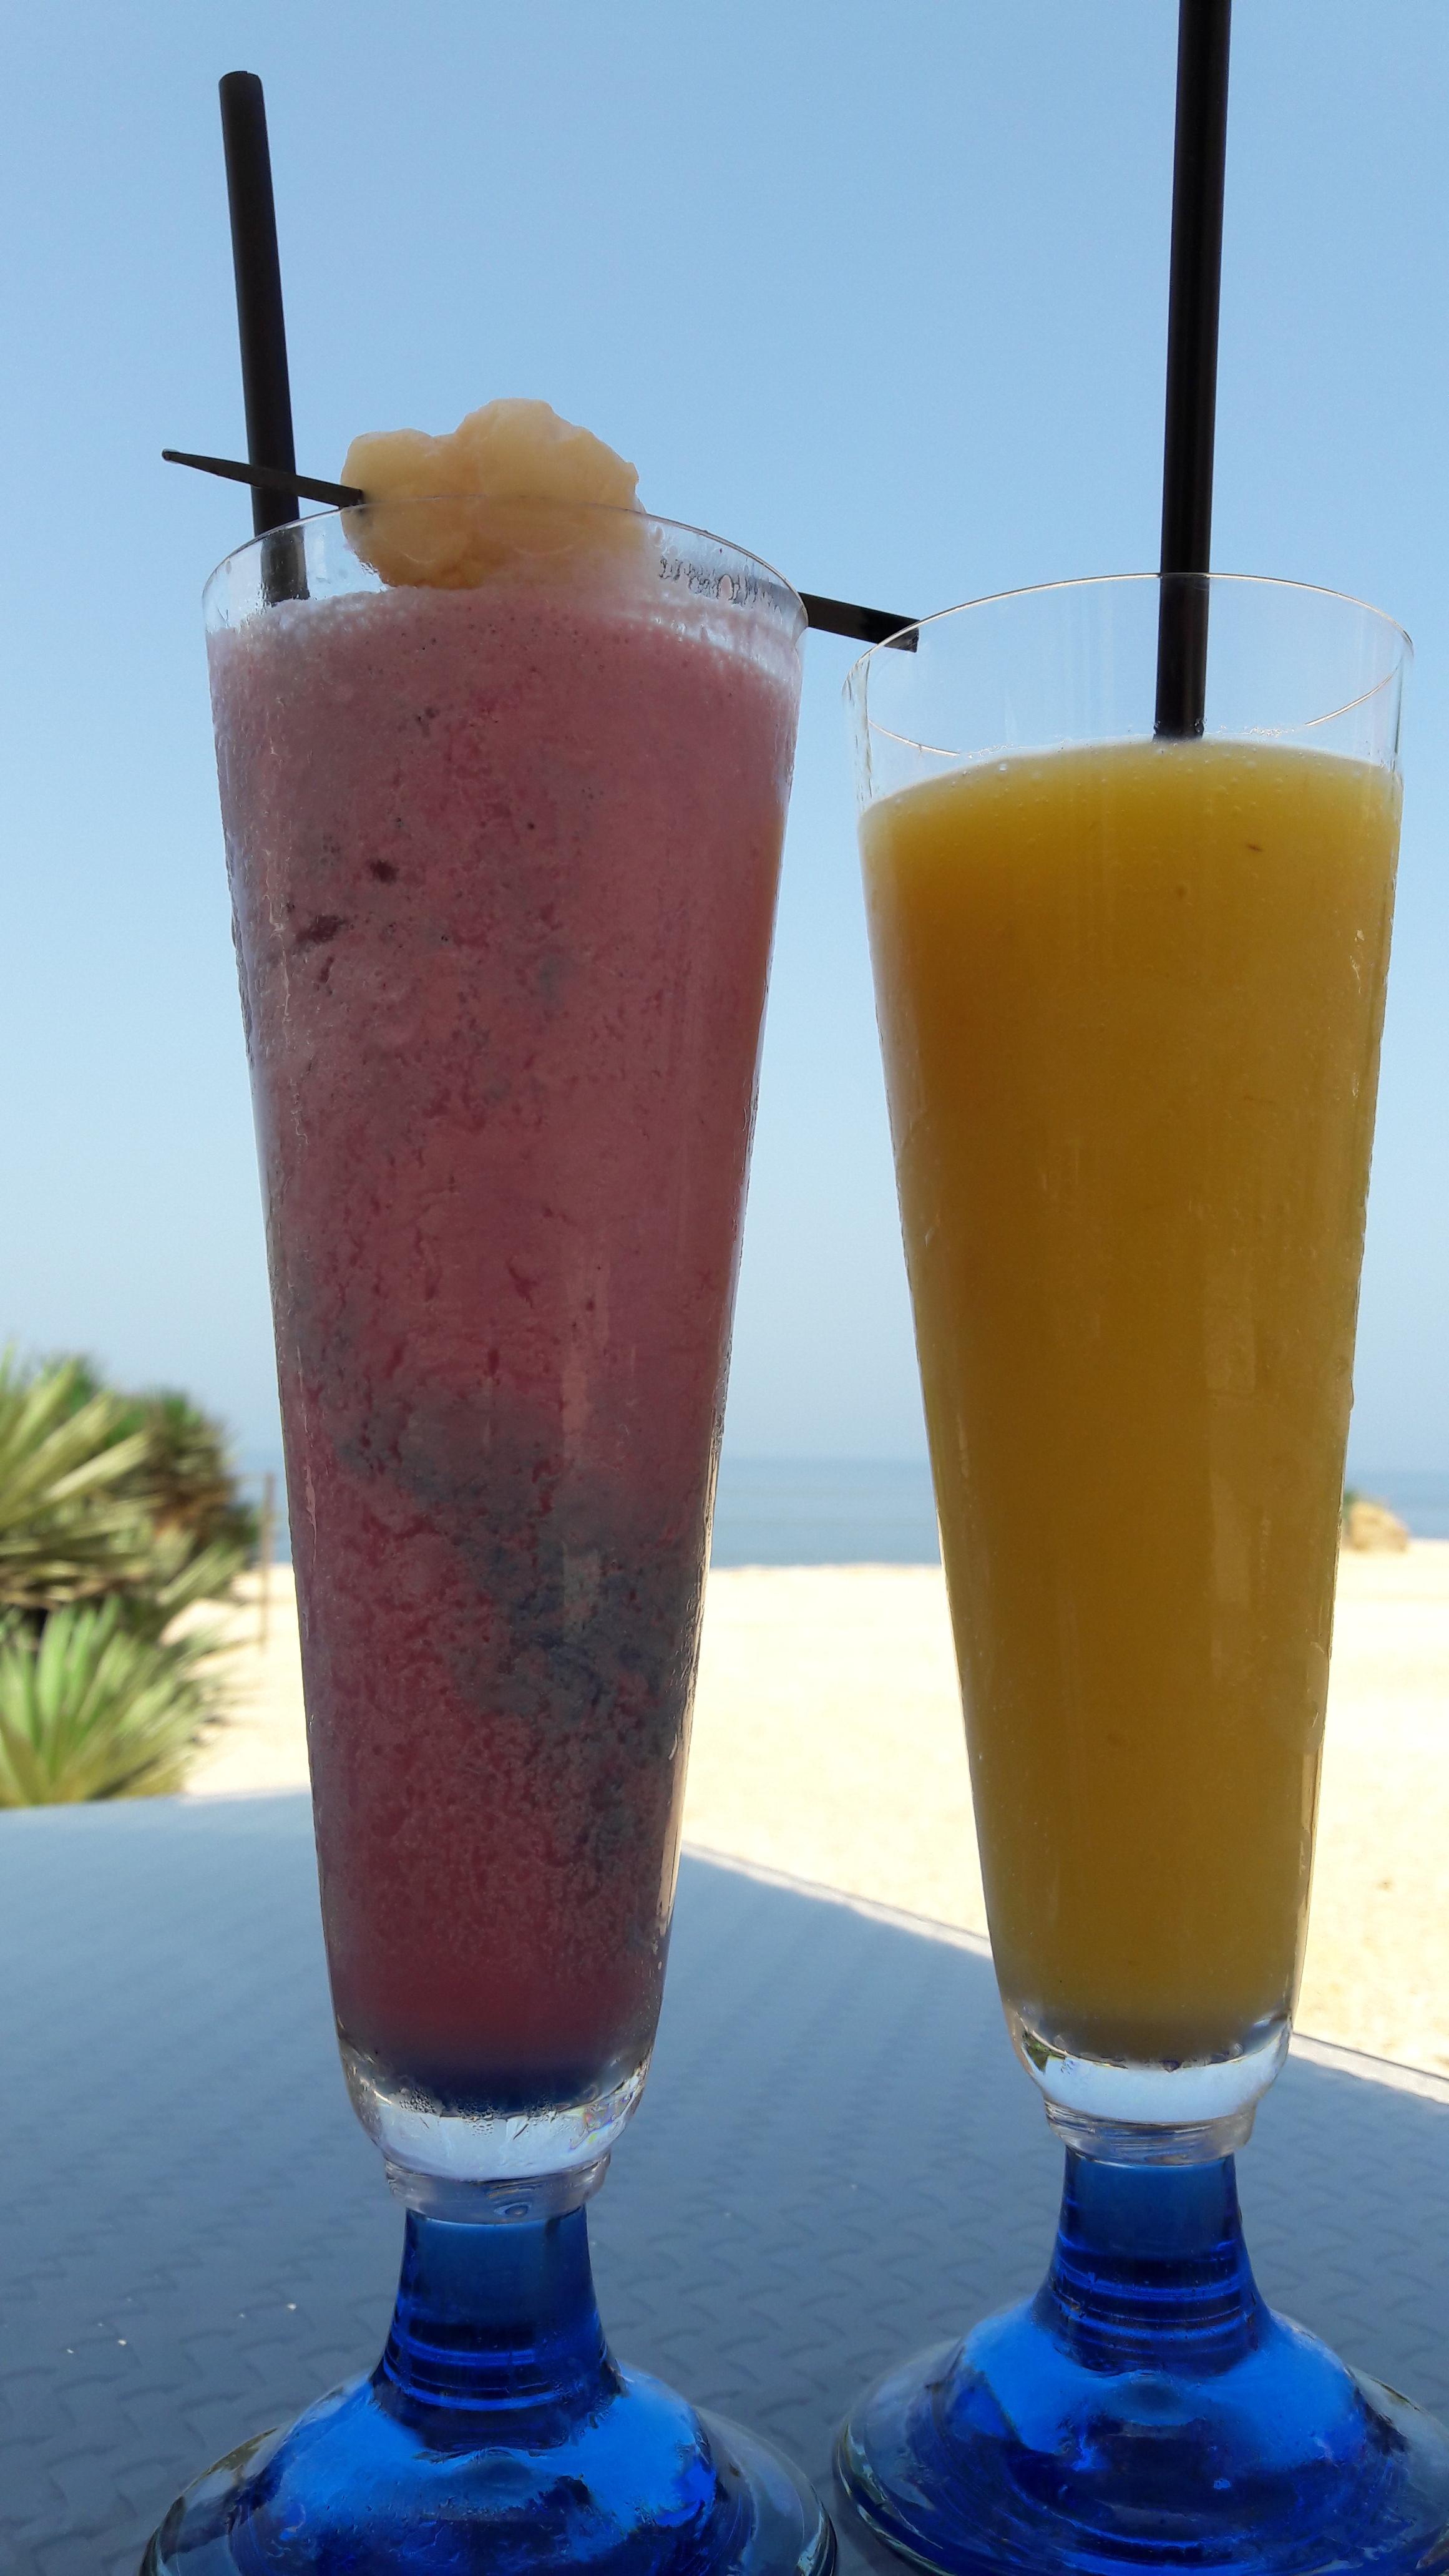 Raspberry Smoothie and Mango Shake (Shangri-La Muscat)